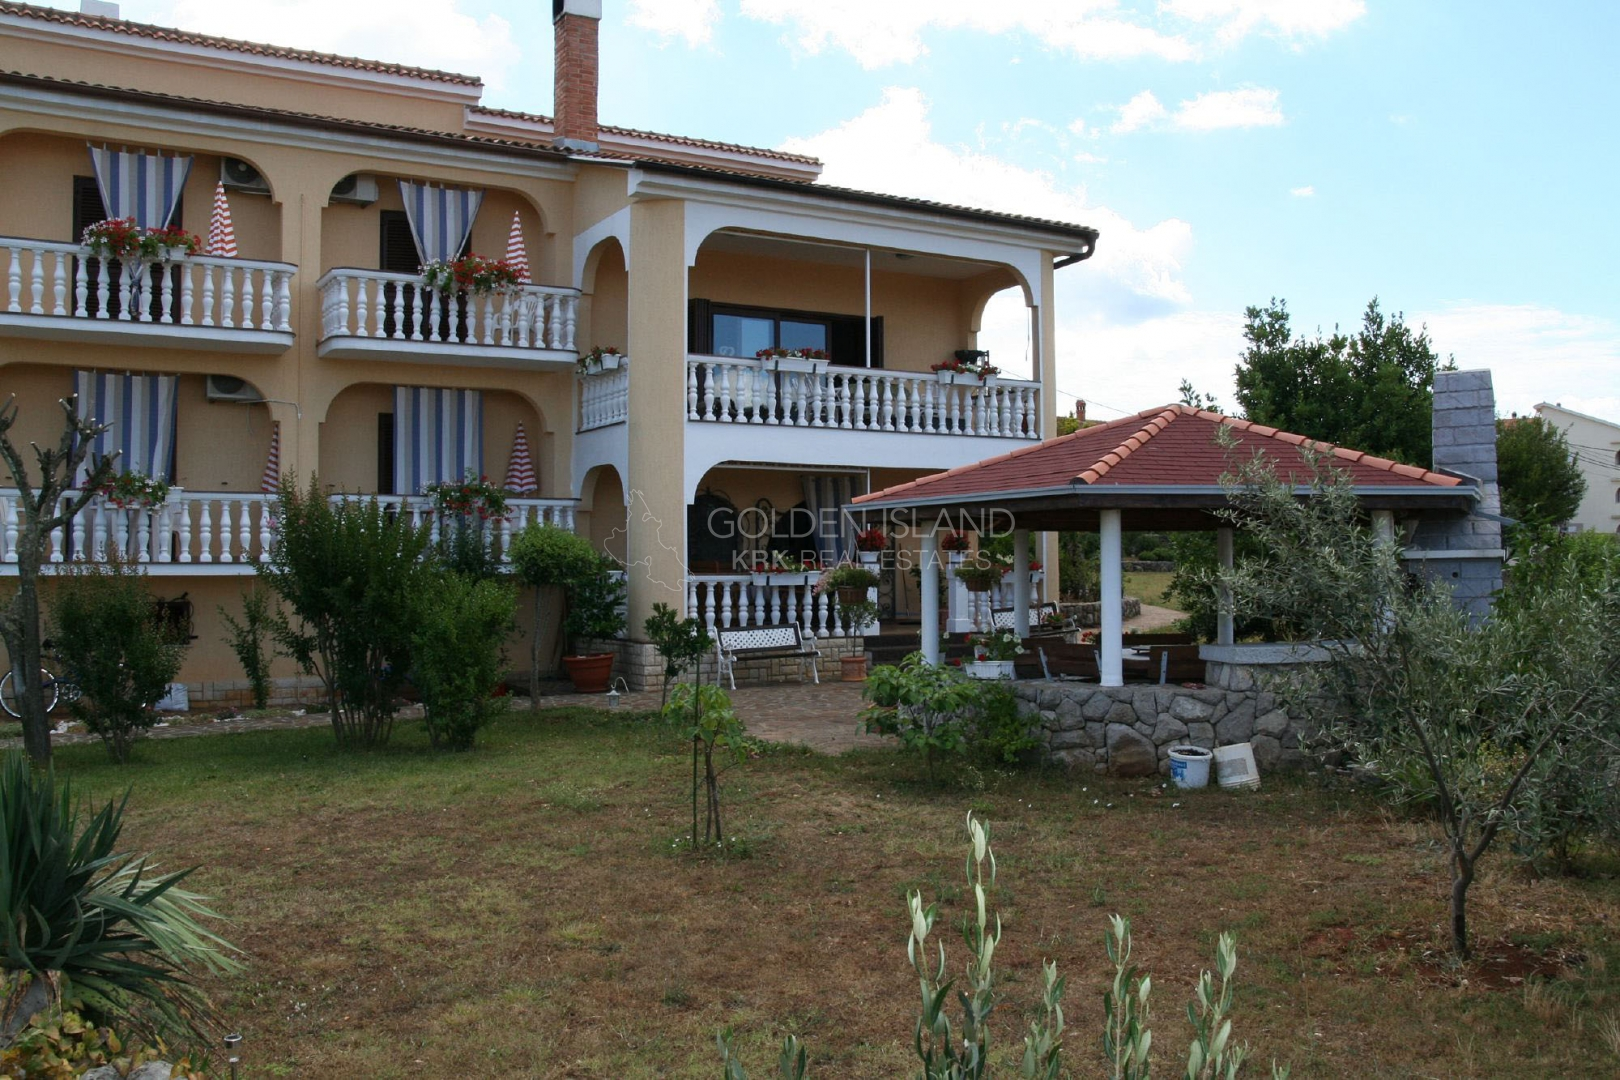 Otok KRK Obiteljska raskošna Villa